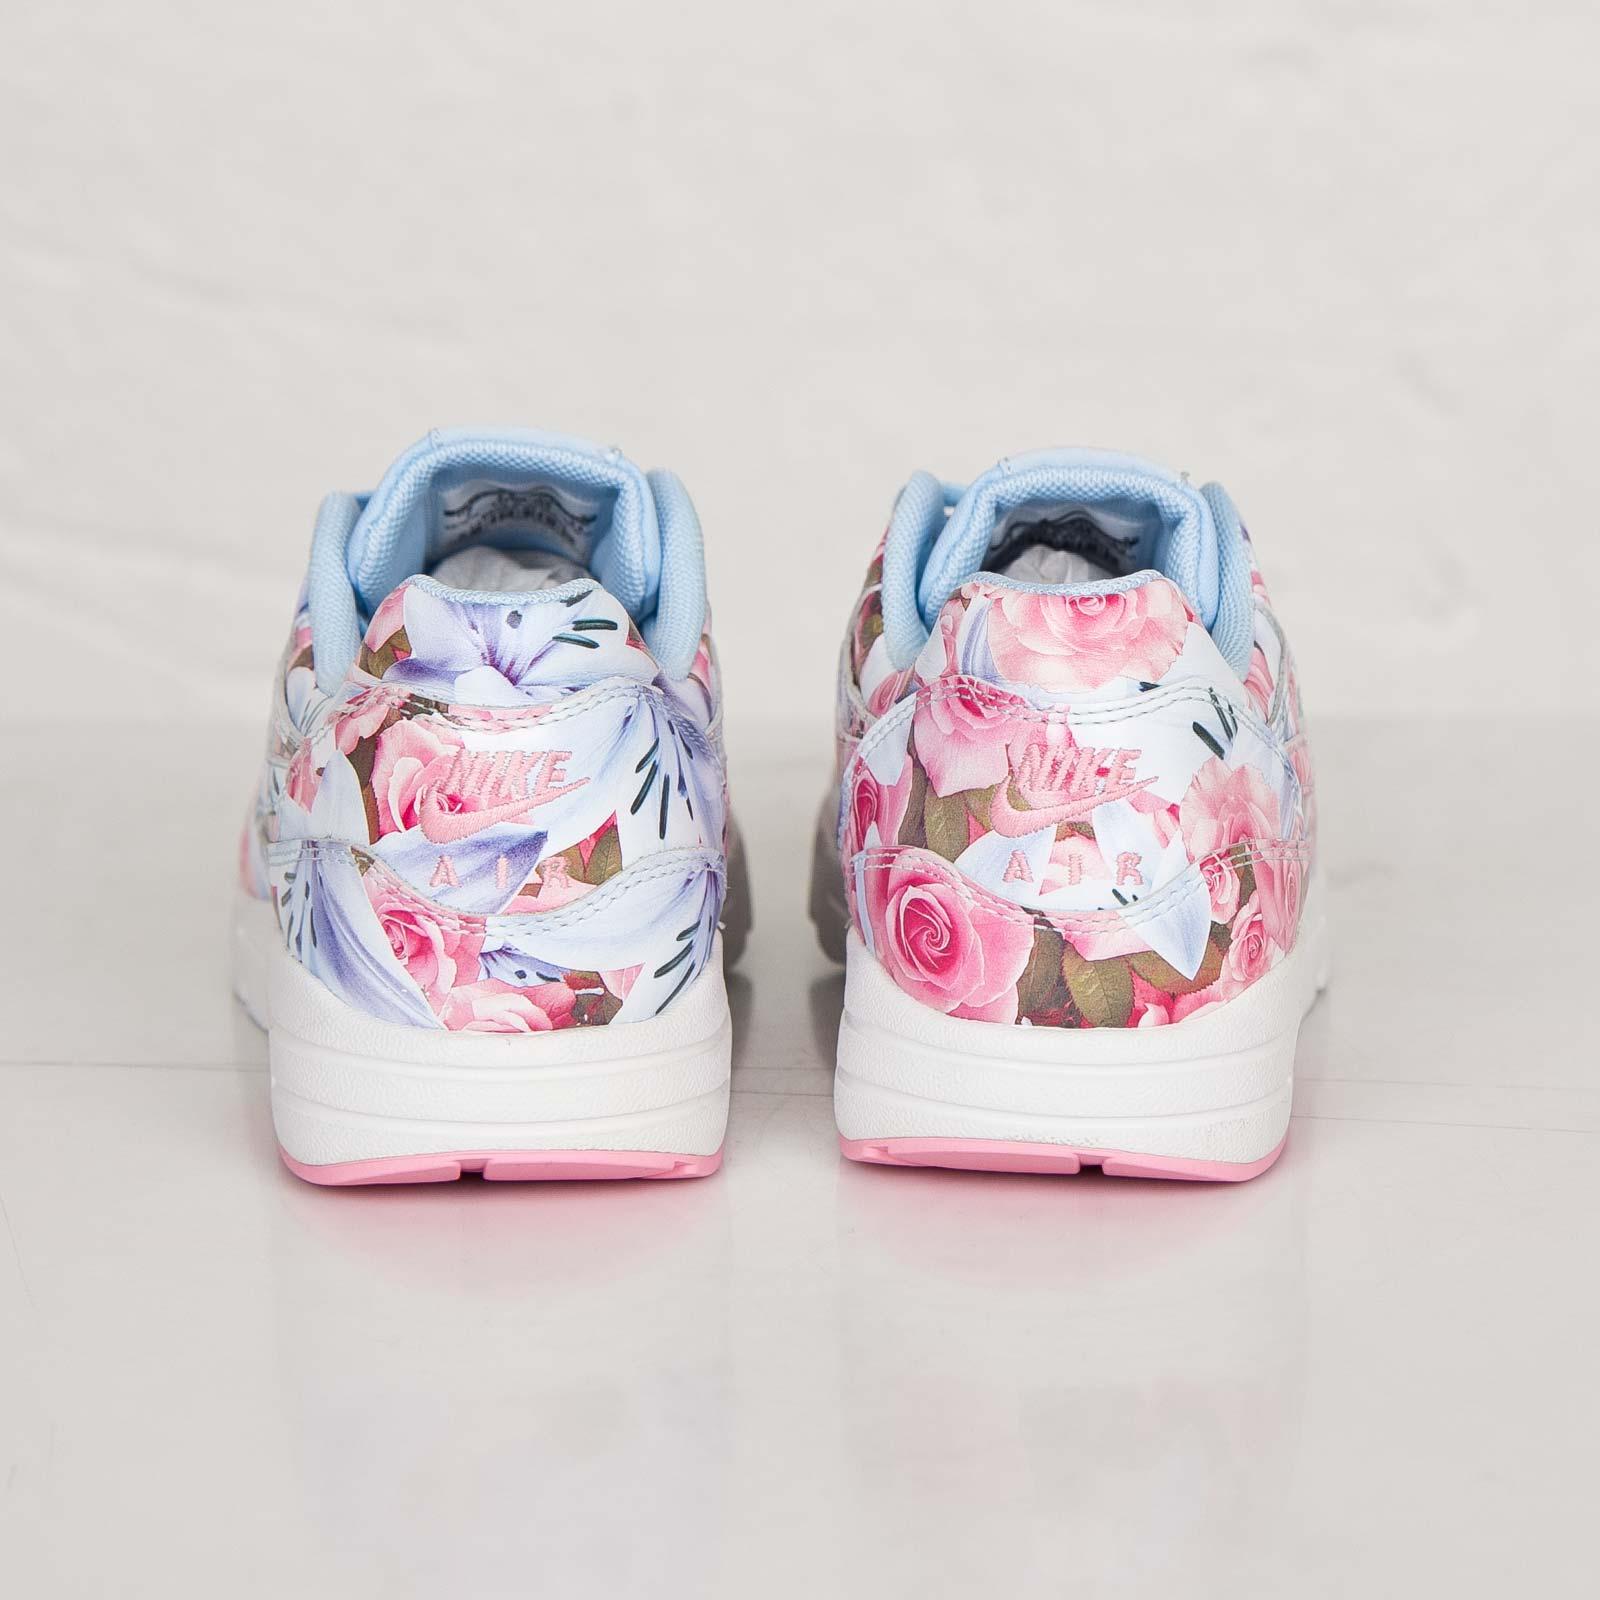 best service 55191 f026f Nike W Air Max 1 Ultra LOTC QS - 747105-400 - Sneakersnstuff   sneakers    streetwear online since 1999